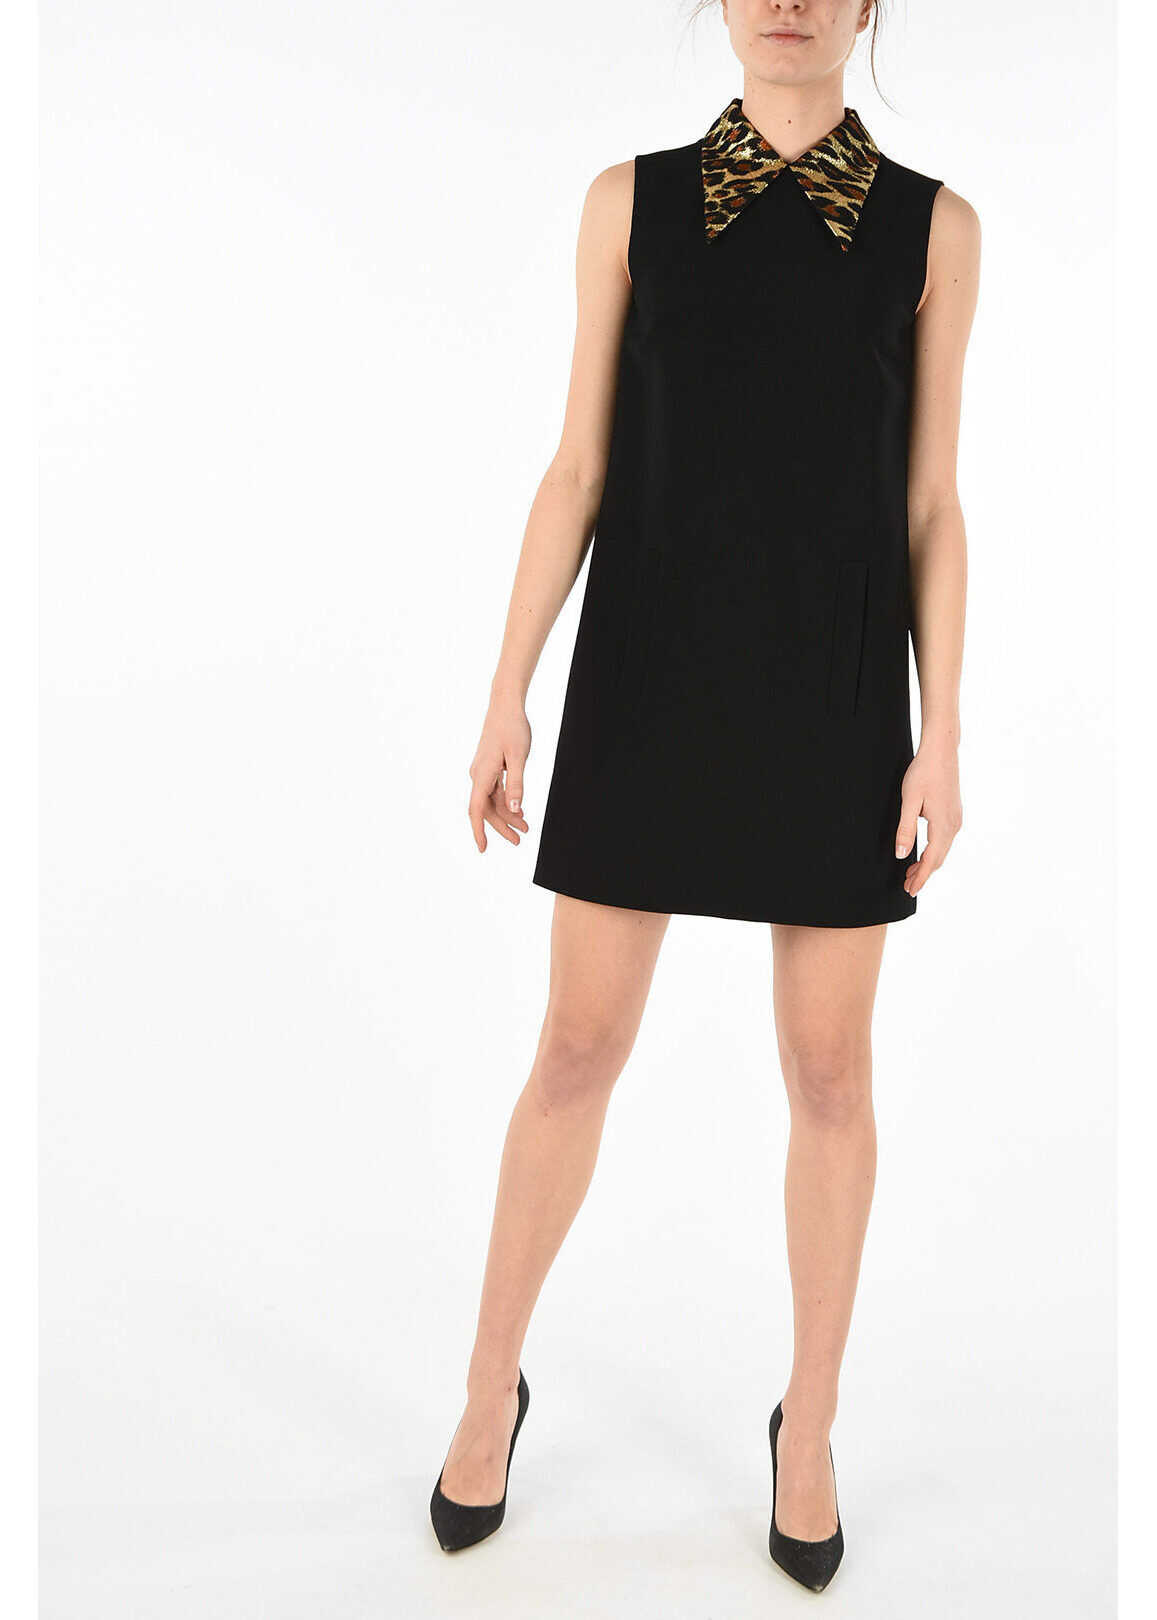 Miu Miu sleeveless a-line dress BLACK